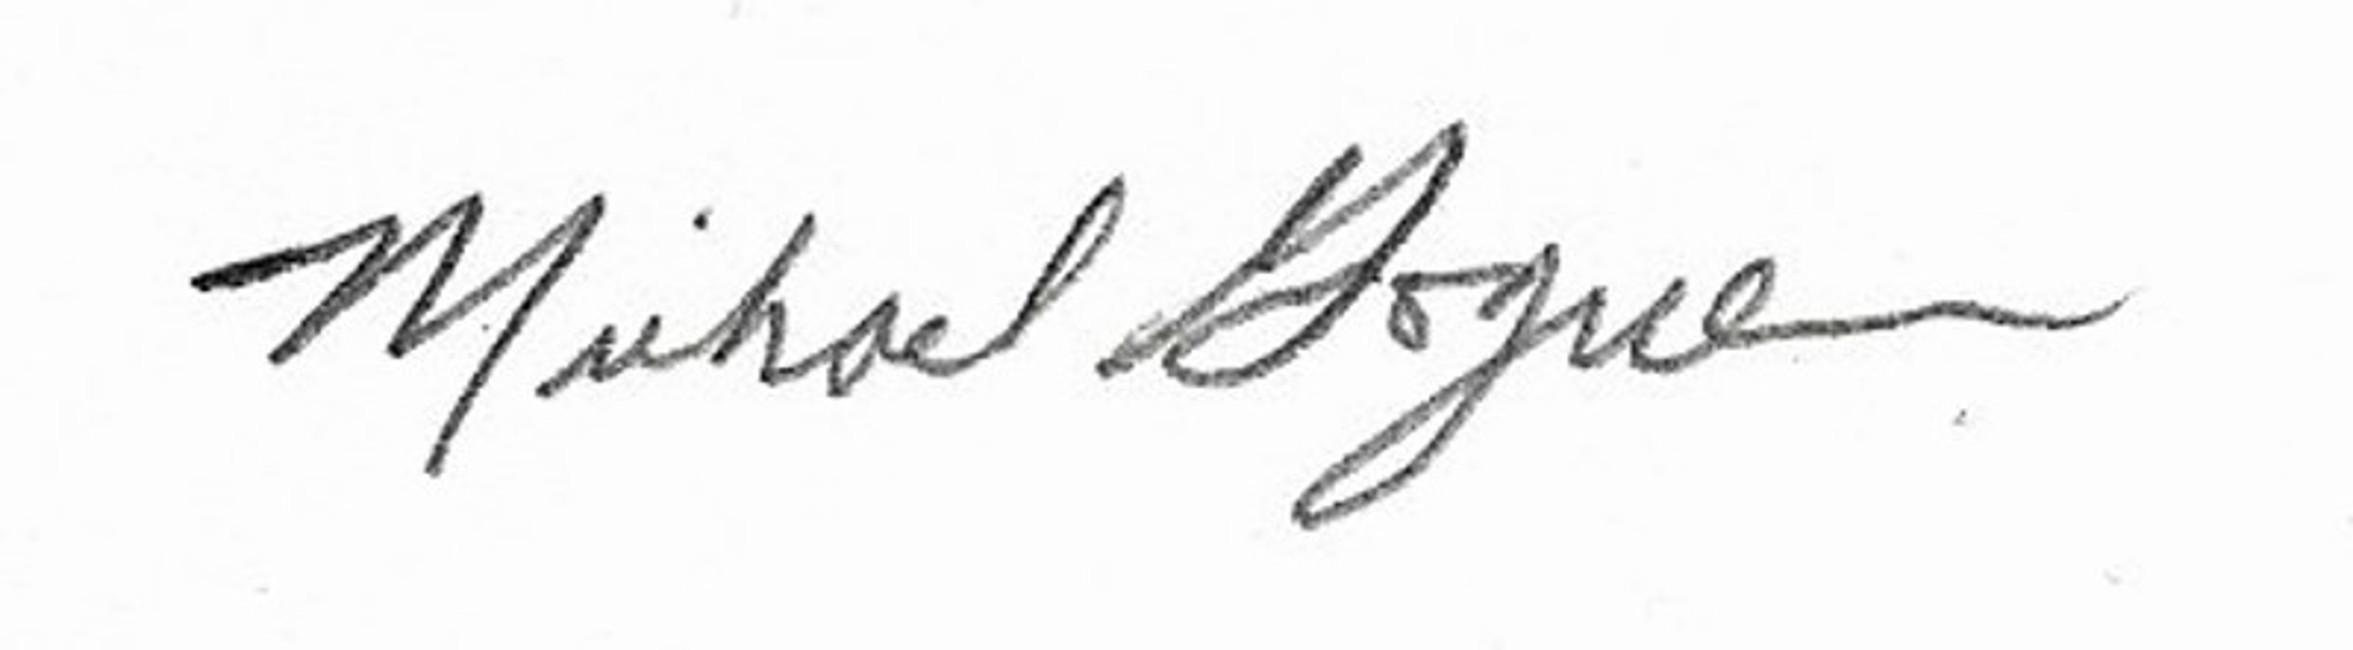 Michael Goguen Signature